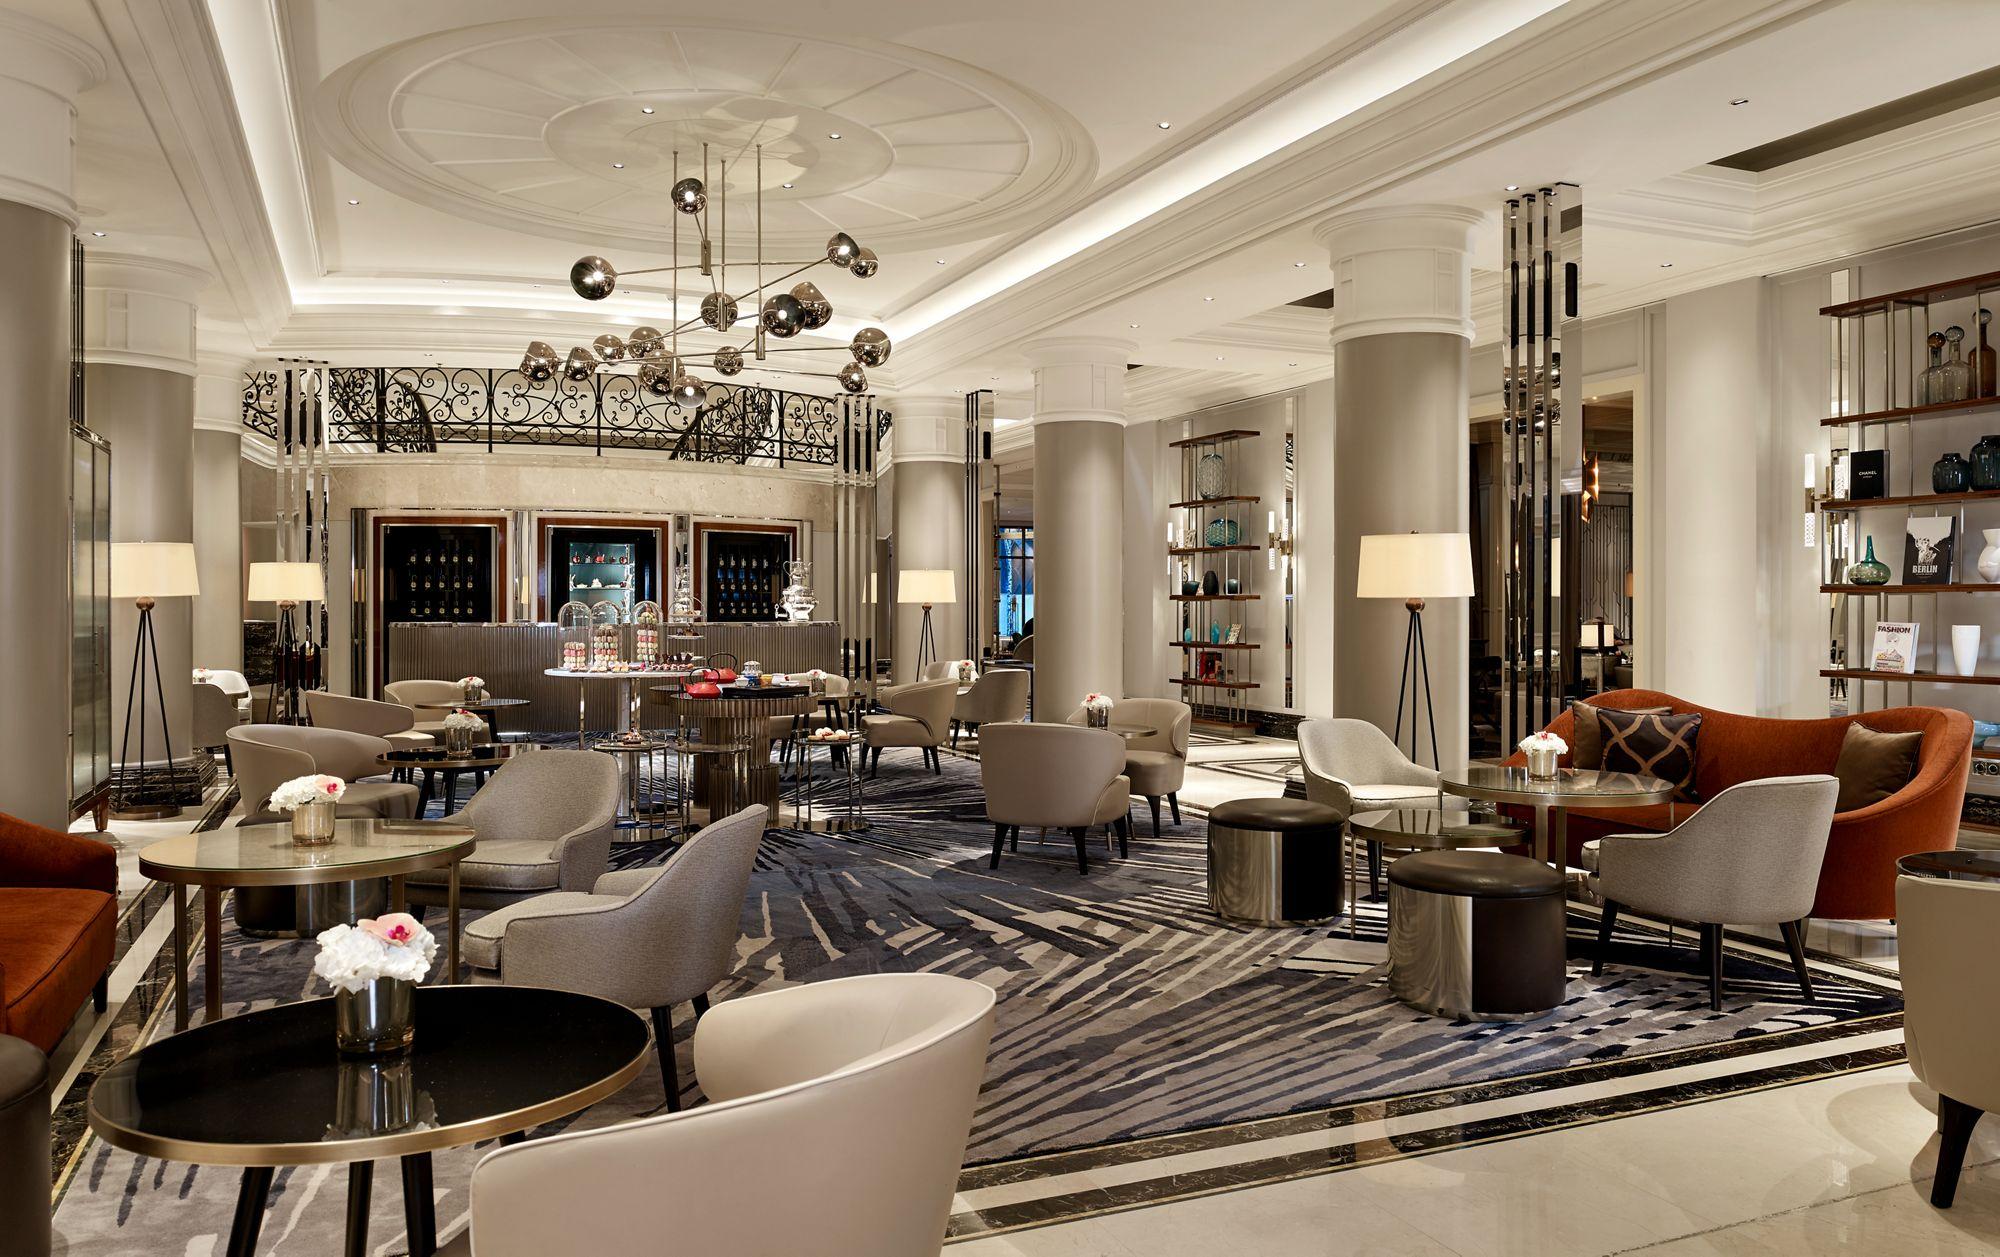 The Lounge | The Ritz-Carlton, Berlin